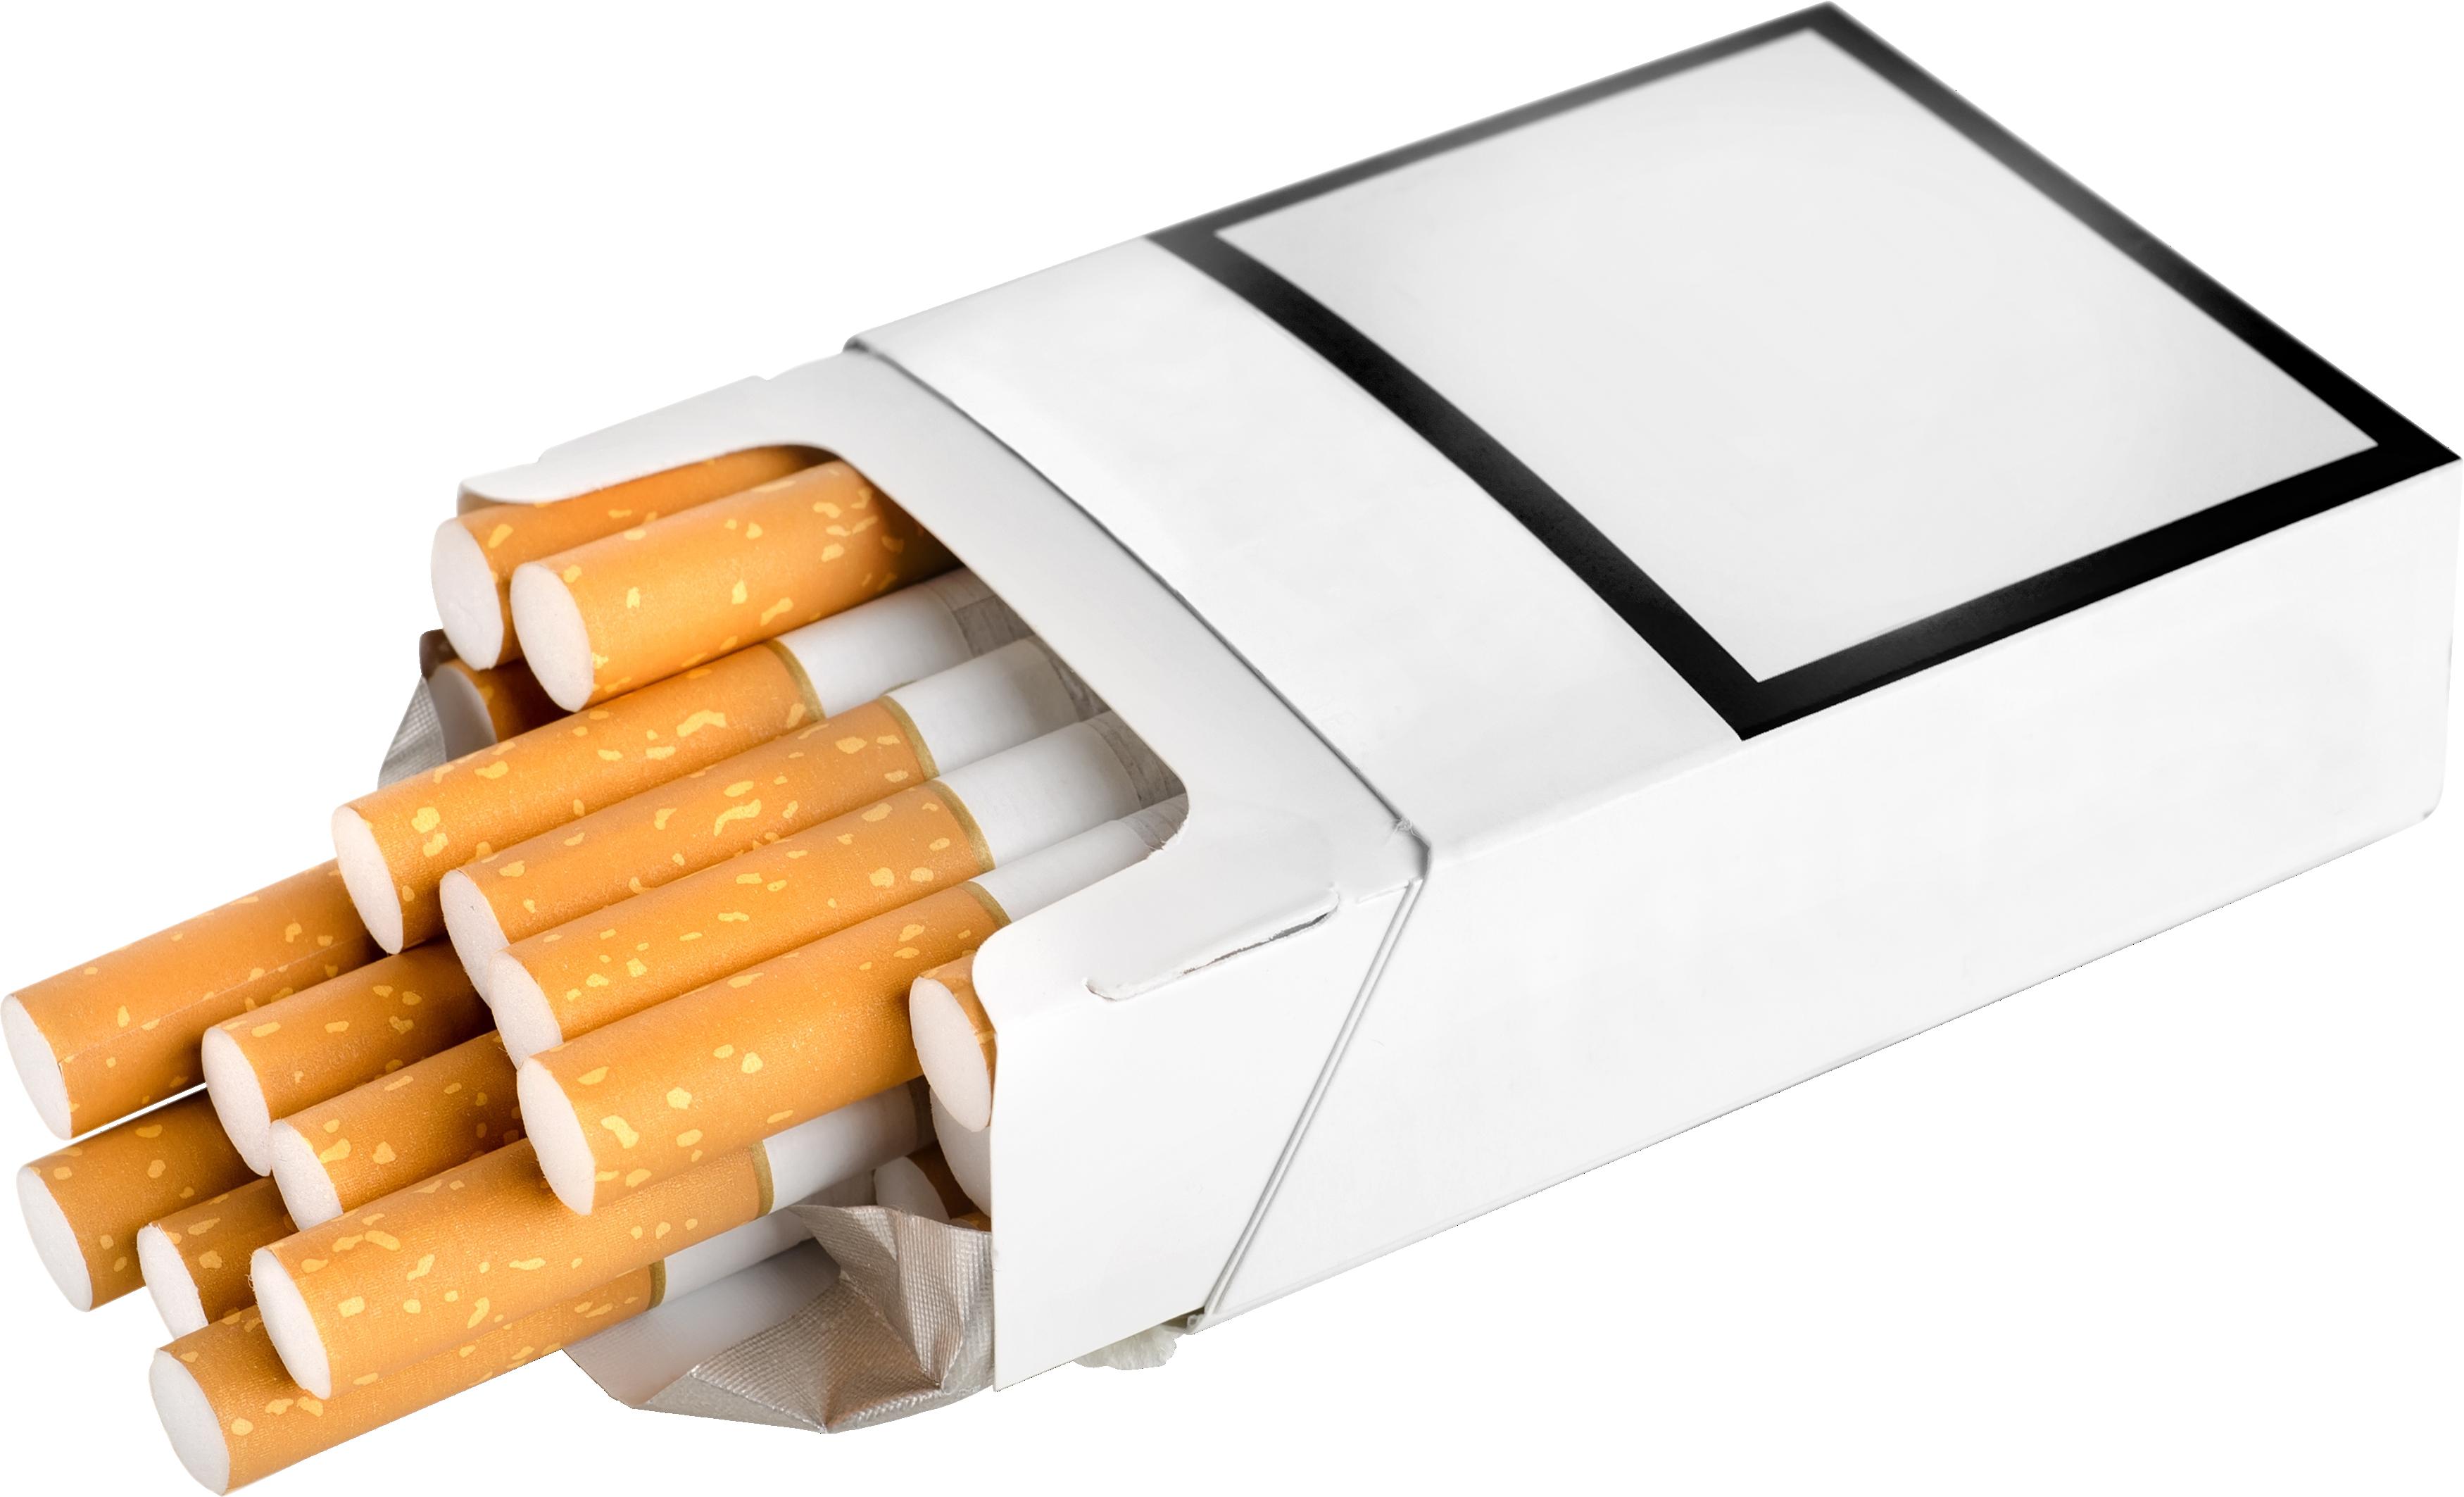 Cigarette Pack PNG Image.